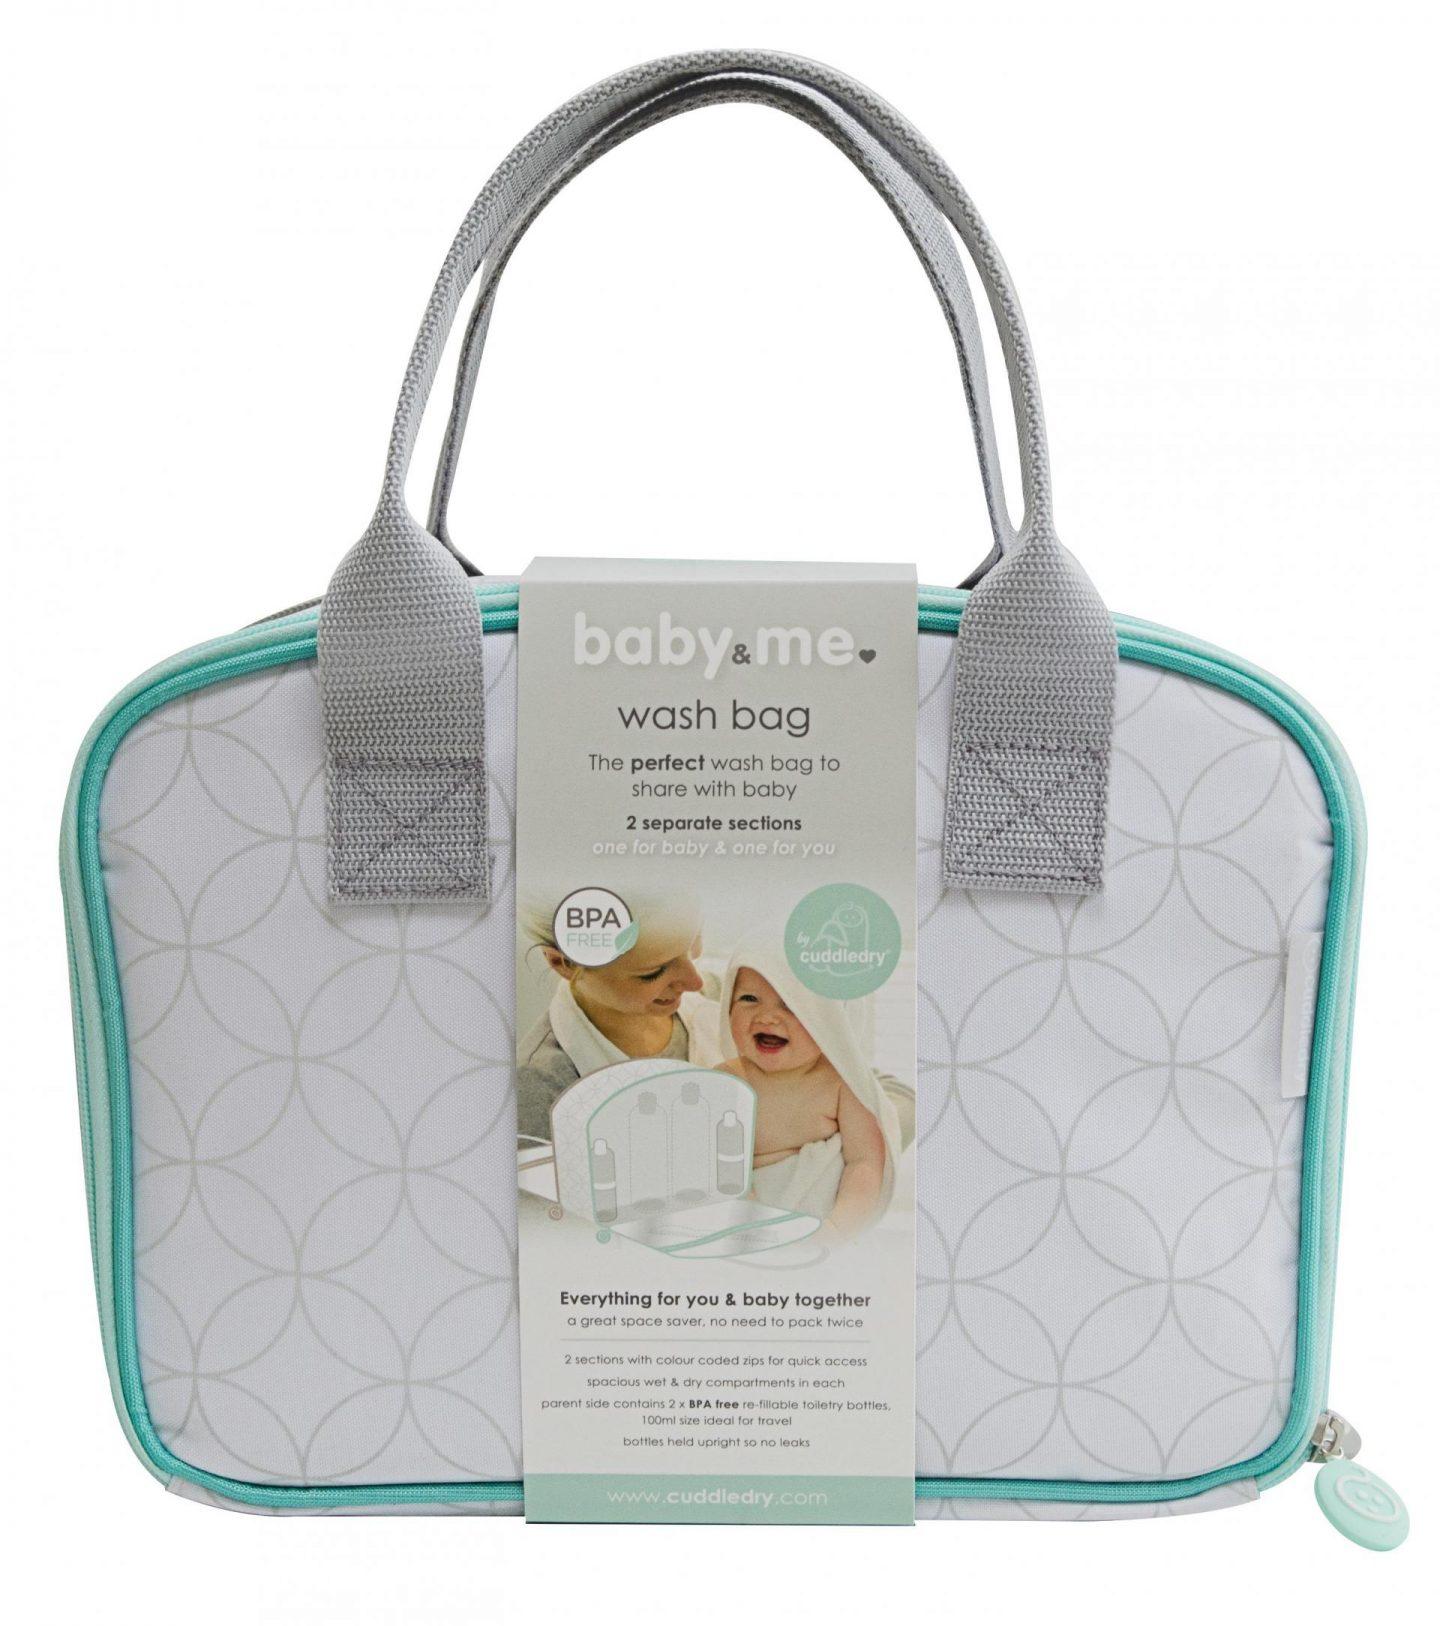 Giveaway | Win a Cuddledry Baby&Me washbag